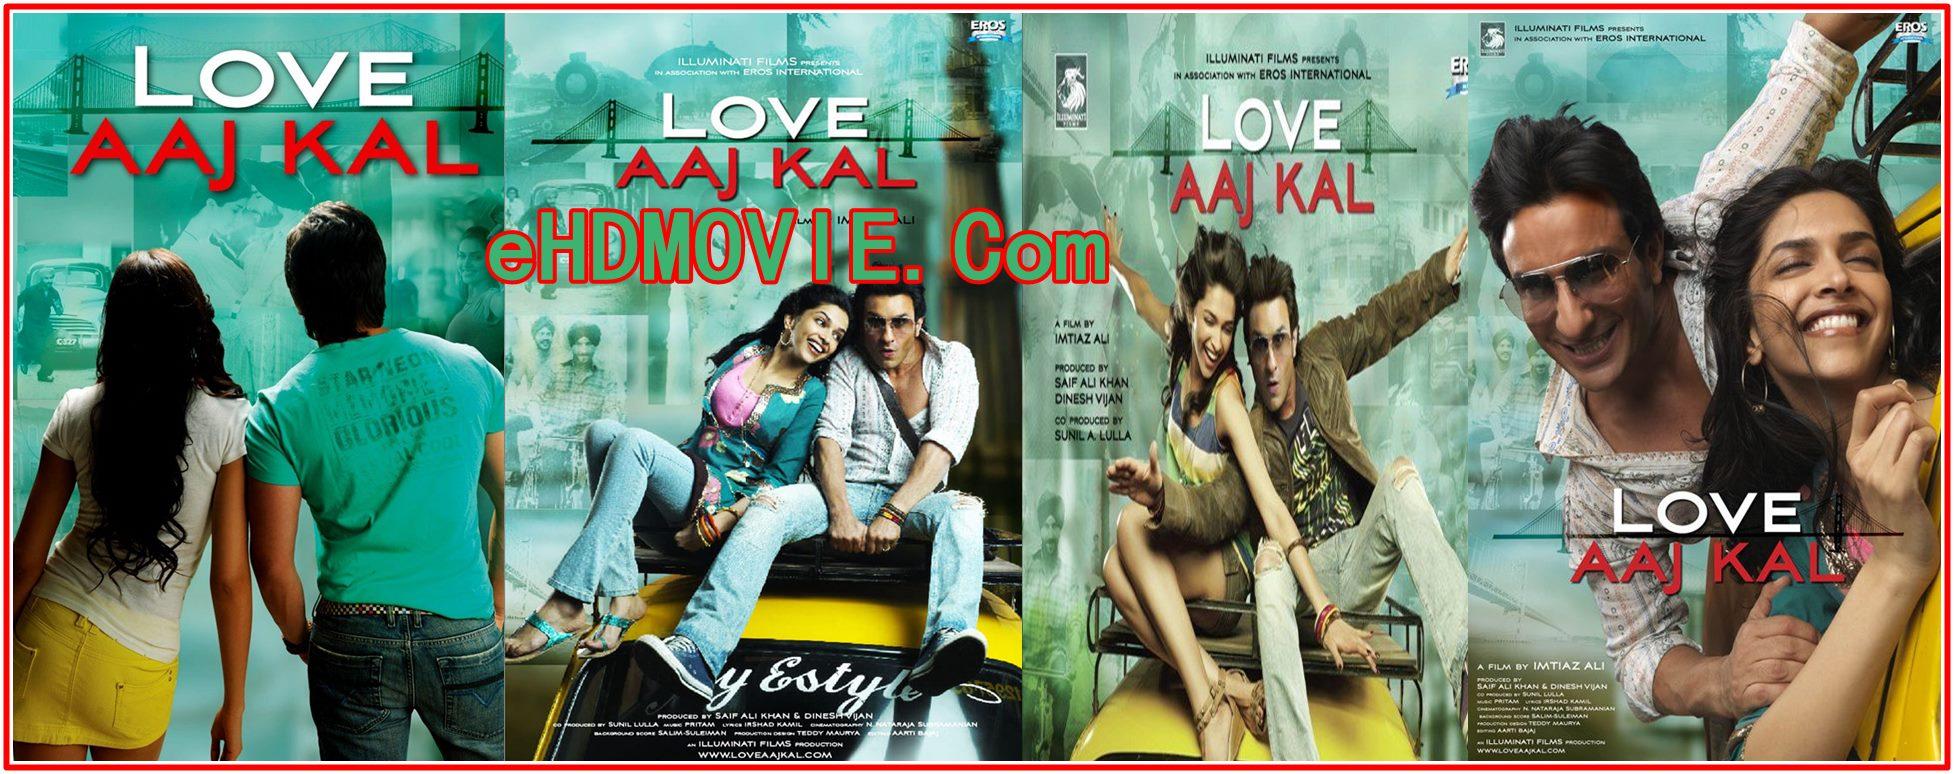 Love Aaj Kal 2009 Full Movie Hindi 720p – 480p ORG BRRip 450MB – 1GB ESubs Free Download